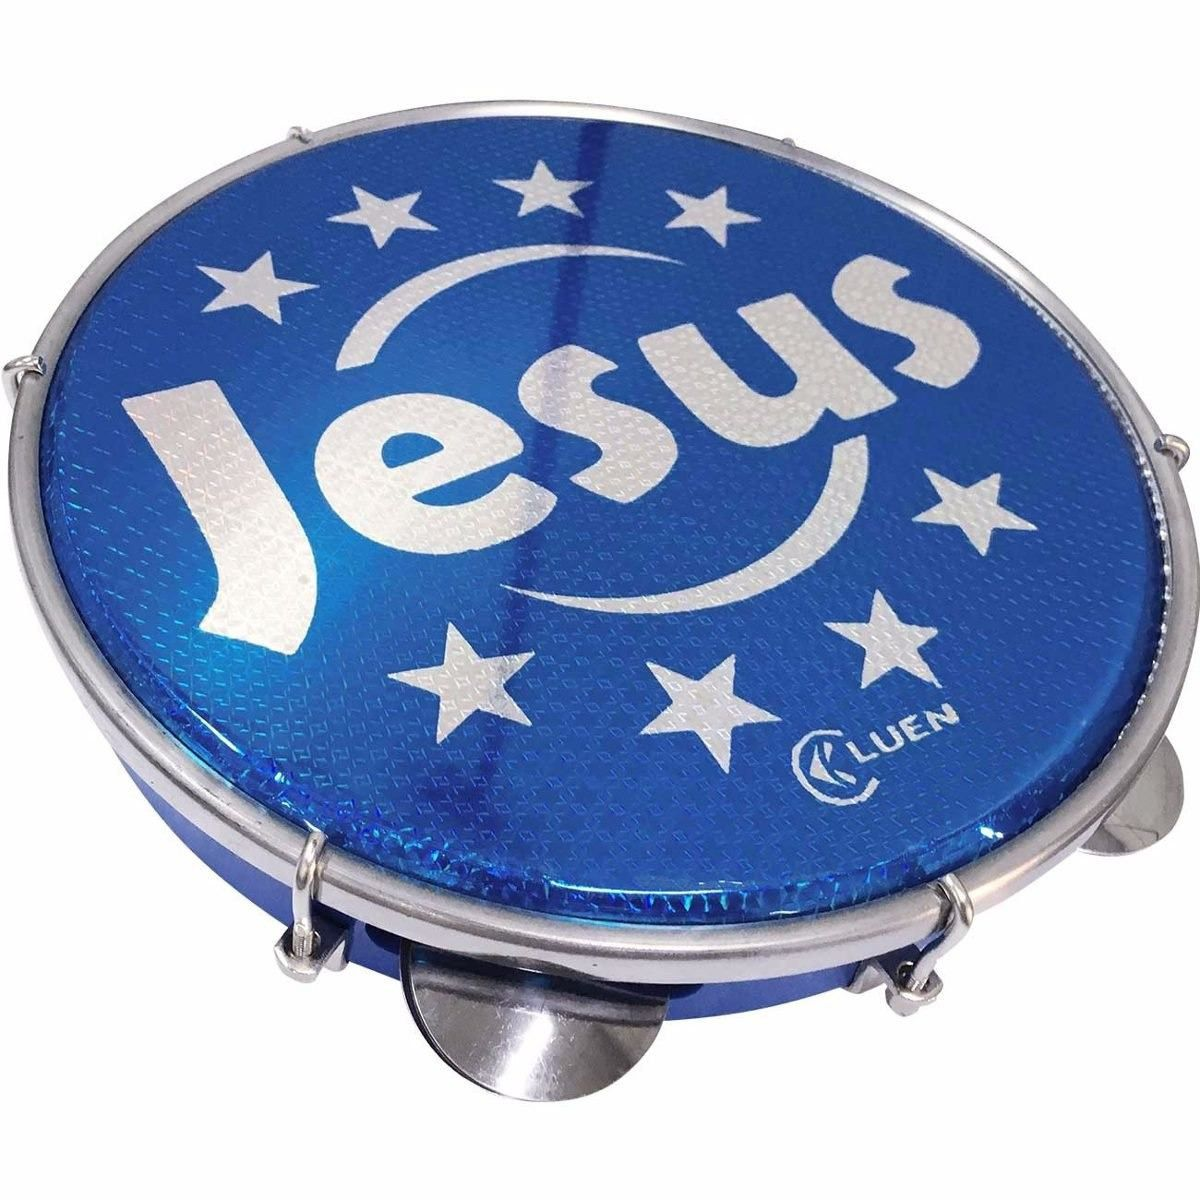 Pandeiro Luen 10 Jesus Aro Abs Azul Pele Holográfica Azul